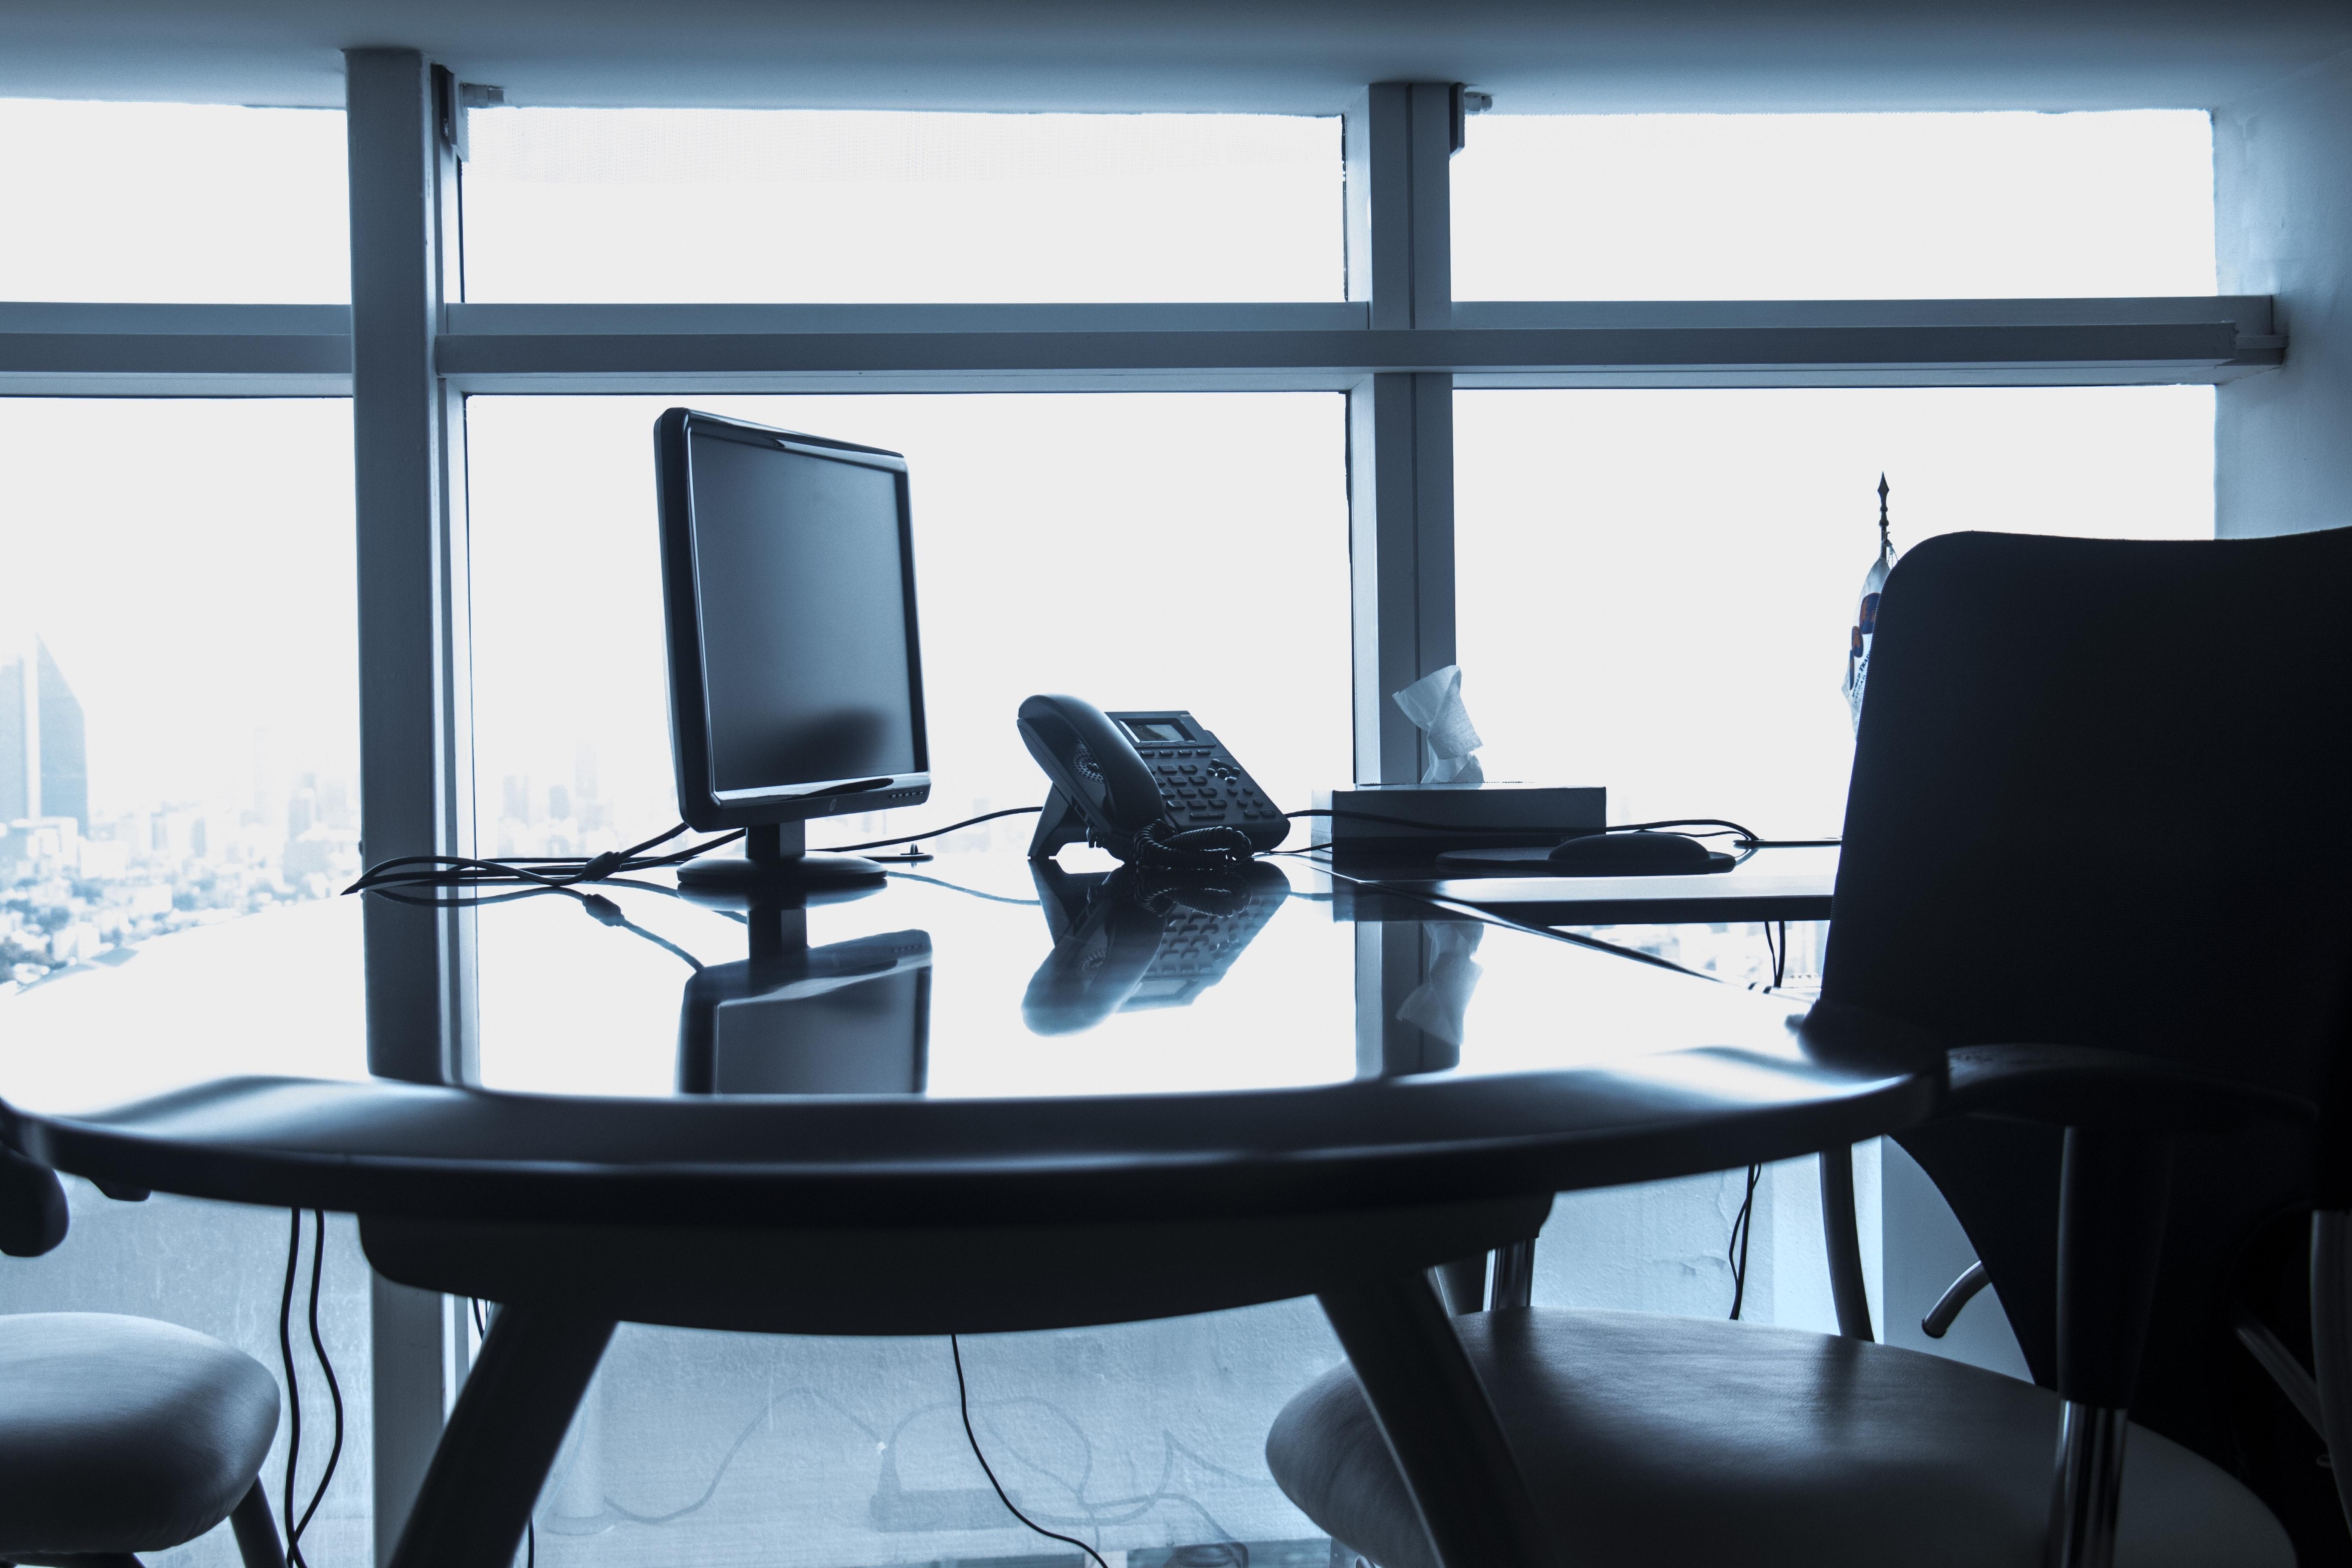 Chairs on Table Against Window, Minimalist, Work, Window, Telephone, HQ Photo